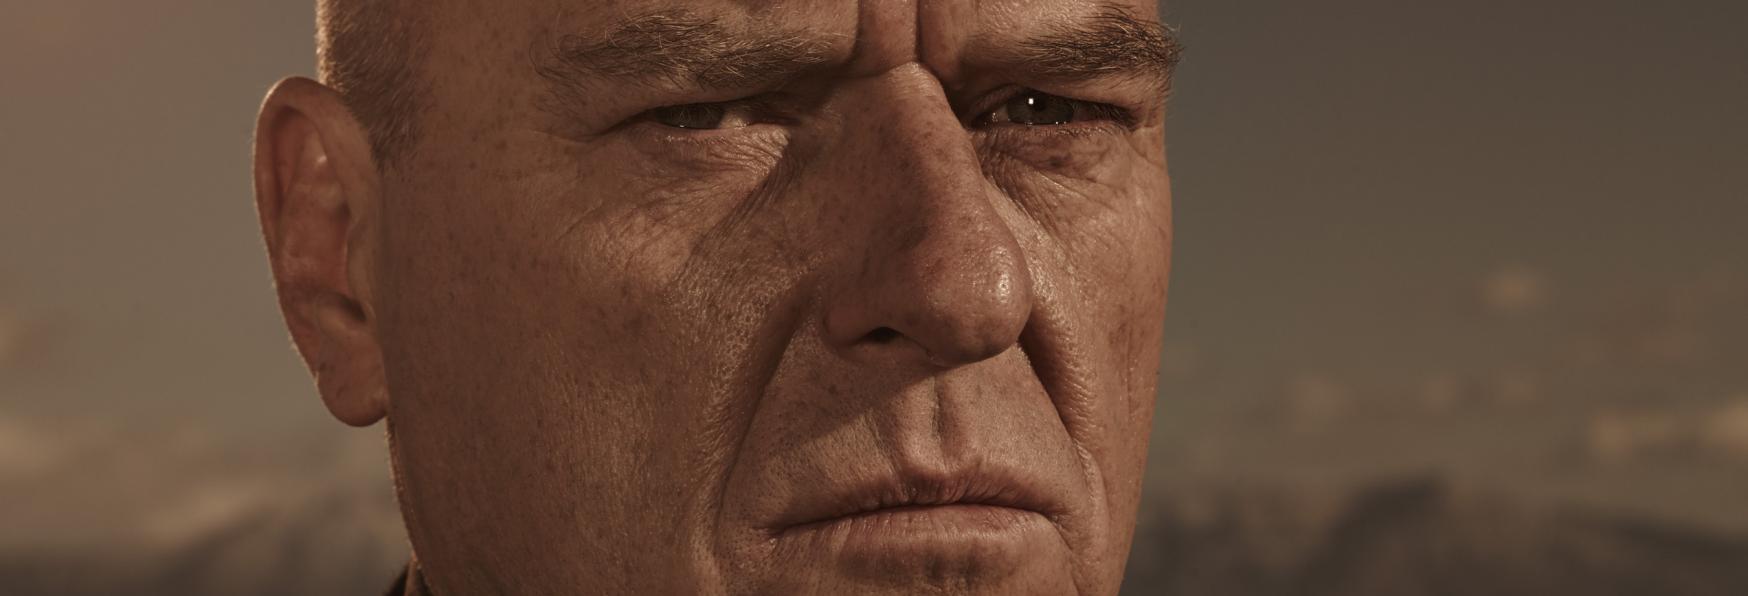 Breaking Bad: Dean Norris pubblica una Scena Tagliata con Hank Protagonista